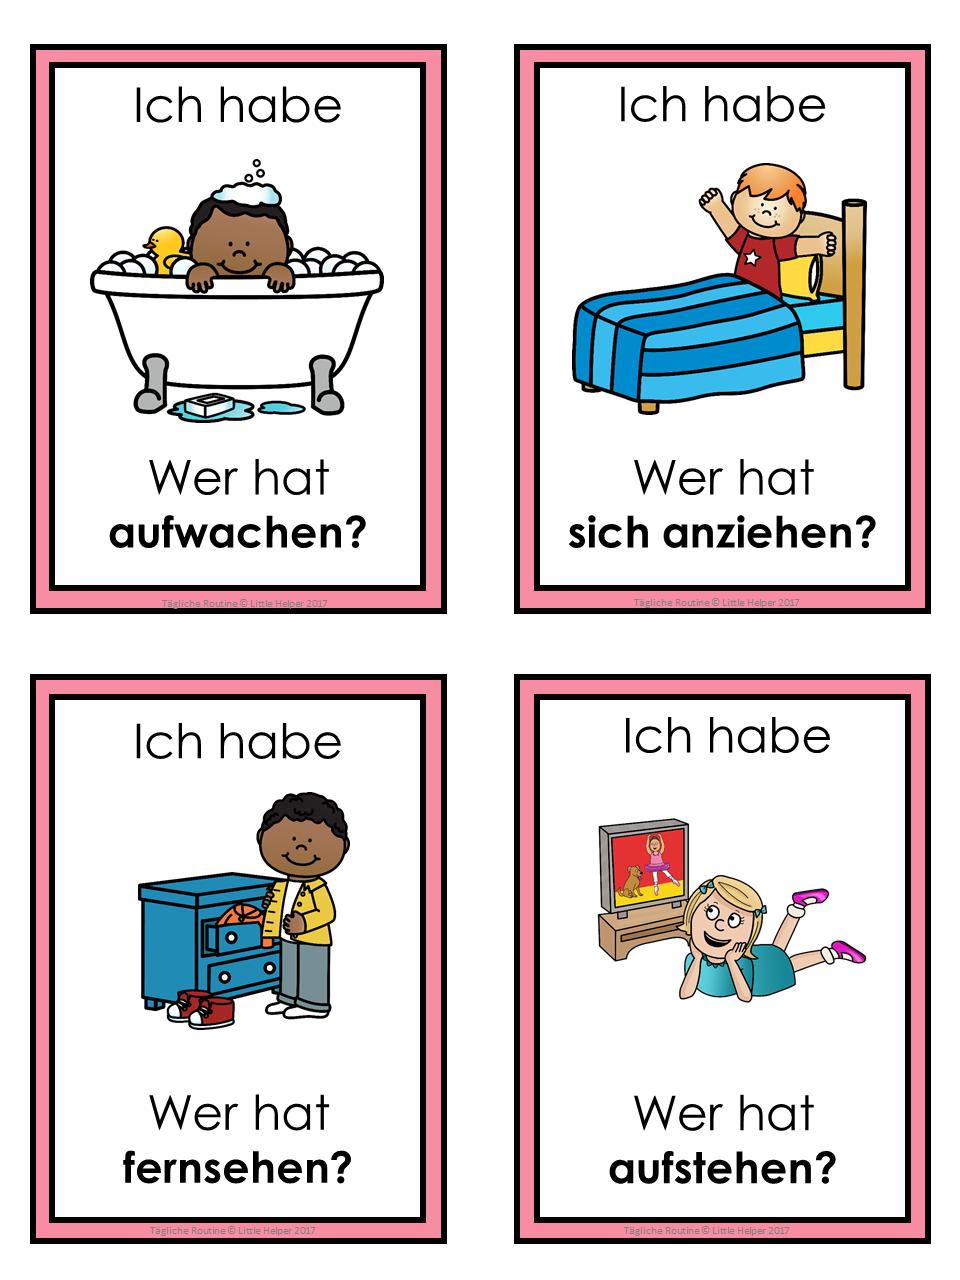 German Daily Routine Ich Habe Wer Hat Game Language Learning App Essay In